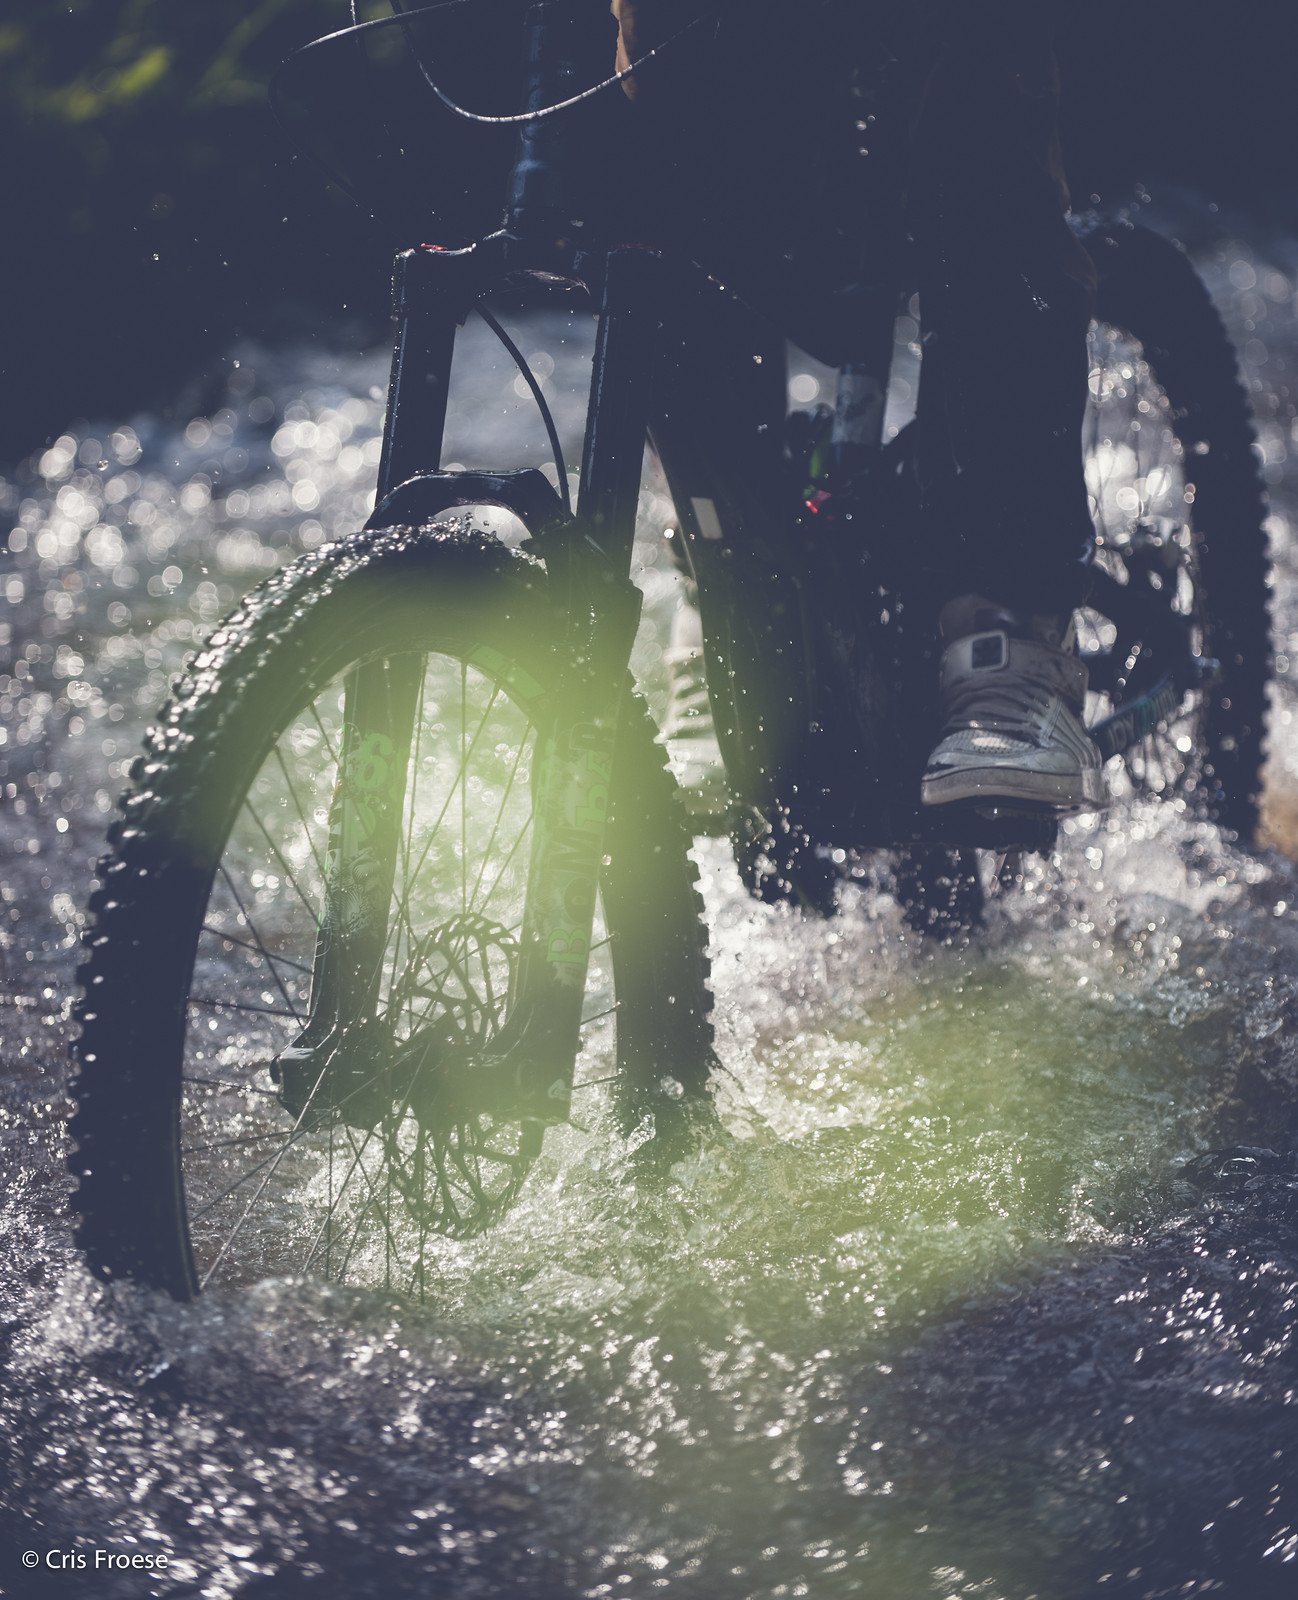 qra splash-3 - MouflonsRiders - Mountain Biking Pictures - Vital MTB